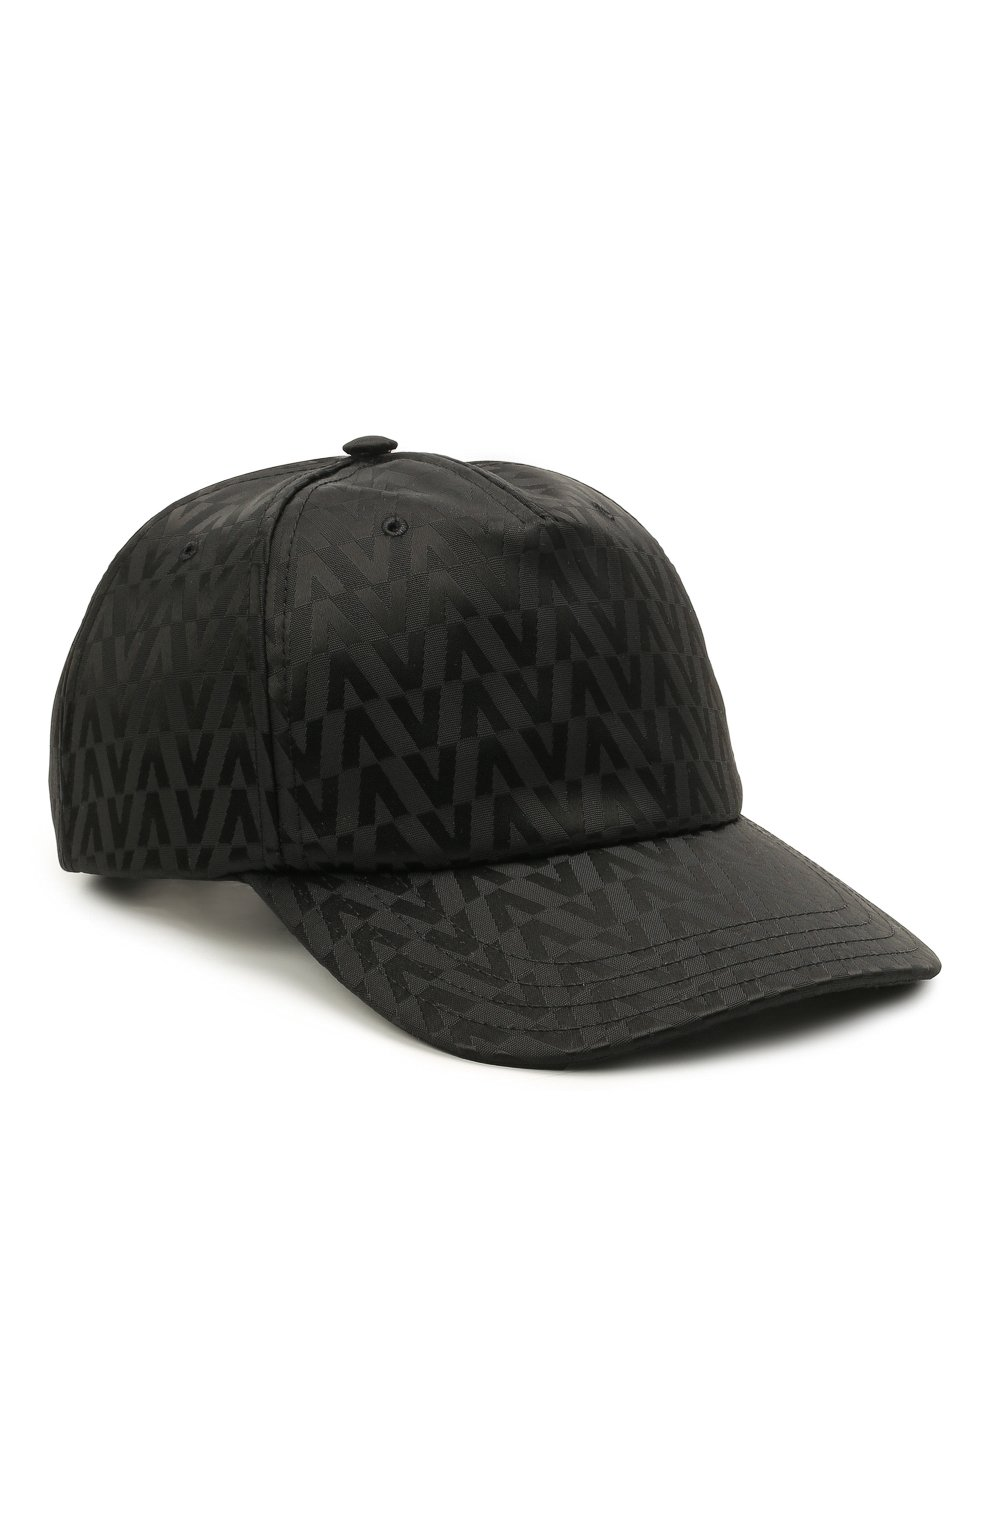 Мужской бейсболка VALENTINO черного цвета, арт. WY2HDA10/MCA   Фото 1 (Материал: Текстиль, Синтетический материал)